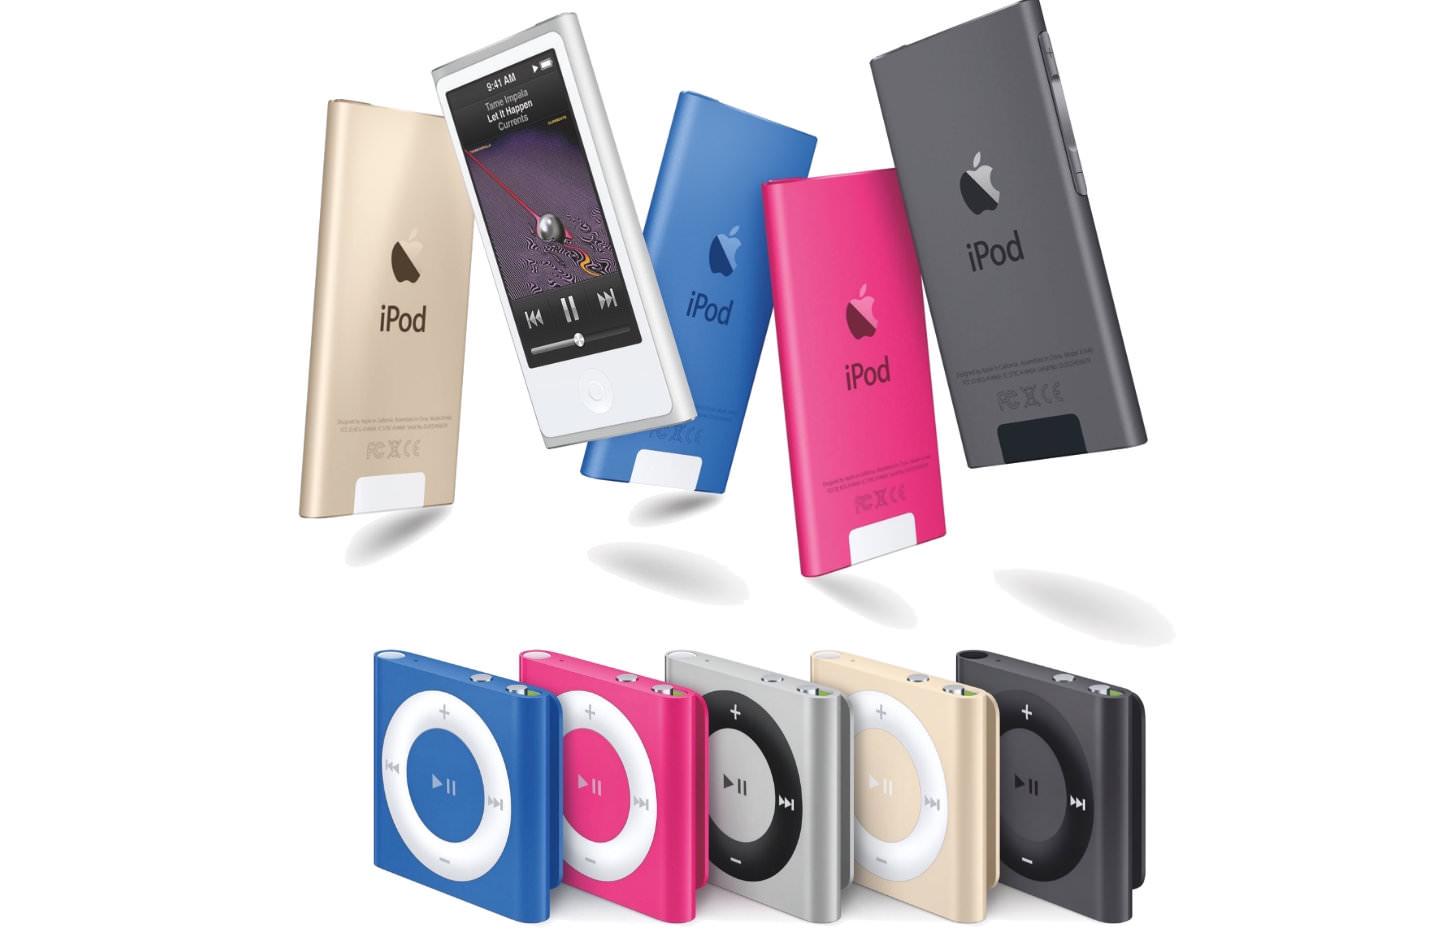 Ipod shuffle and nano